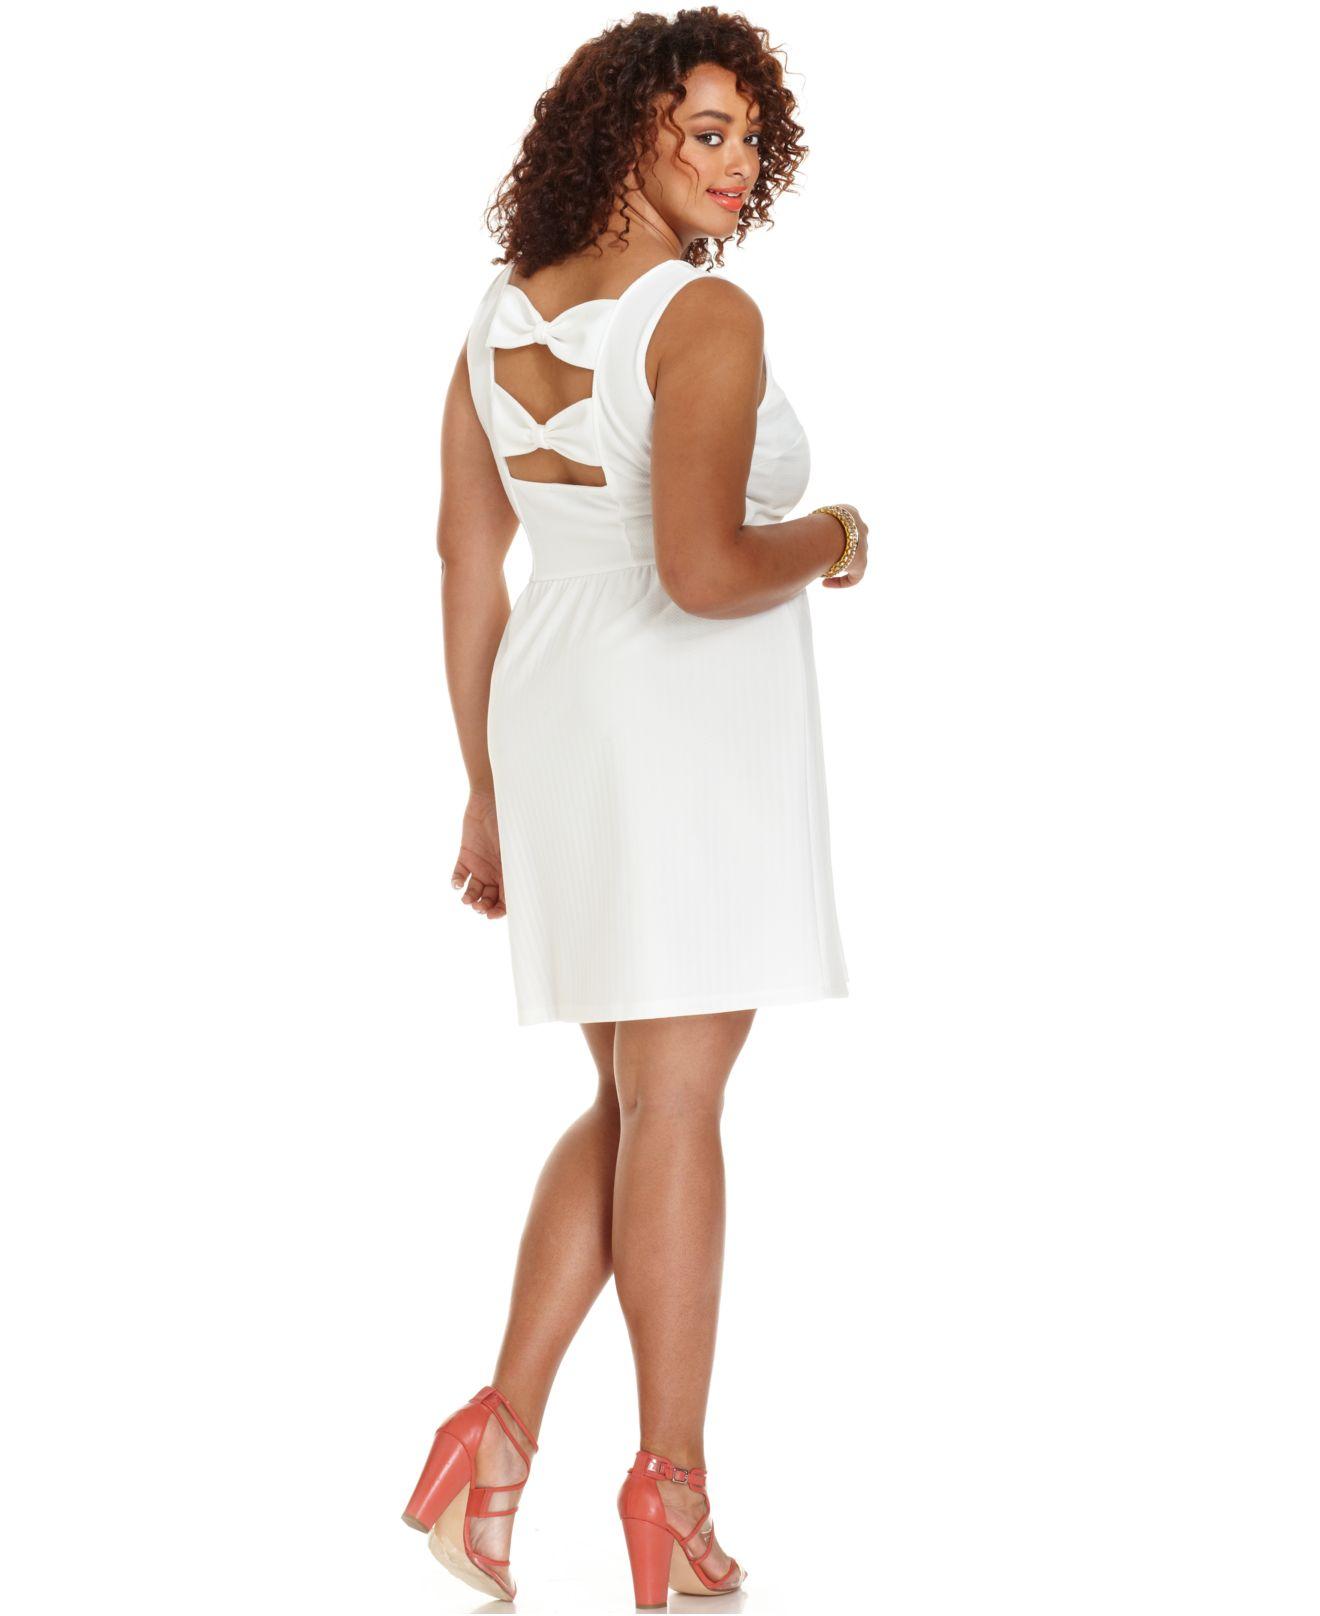 fd1c19a3d1 Lyst - Soprano Plus Size Sleeveless Bowback Skater Dress in White